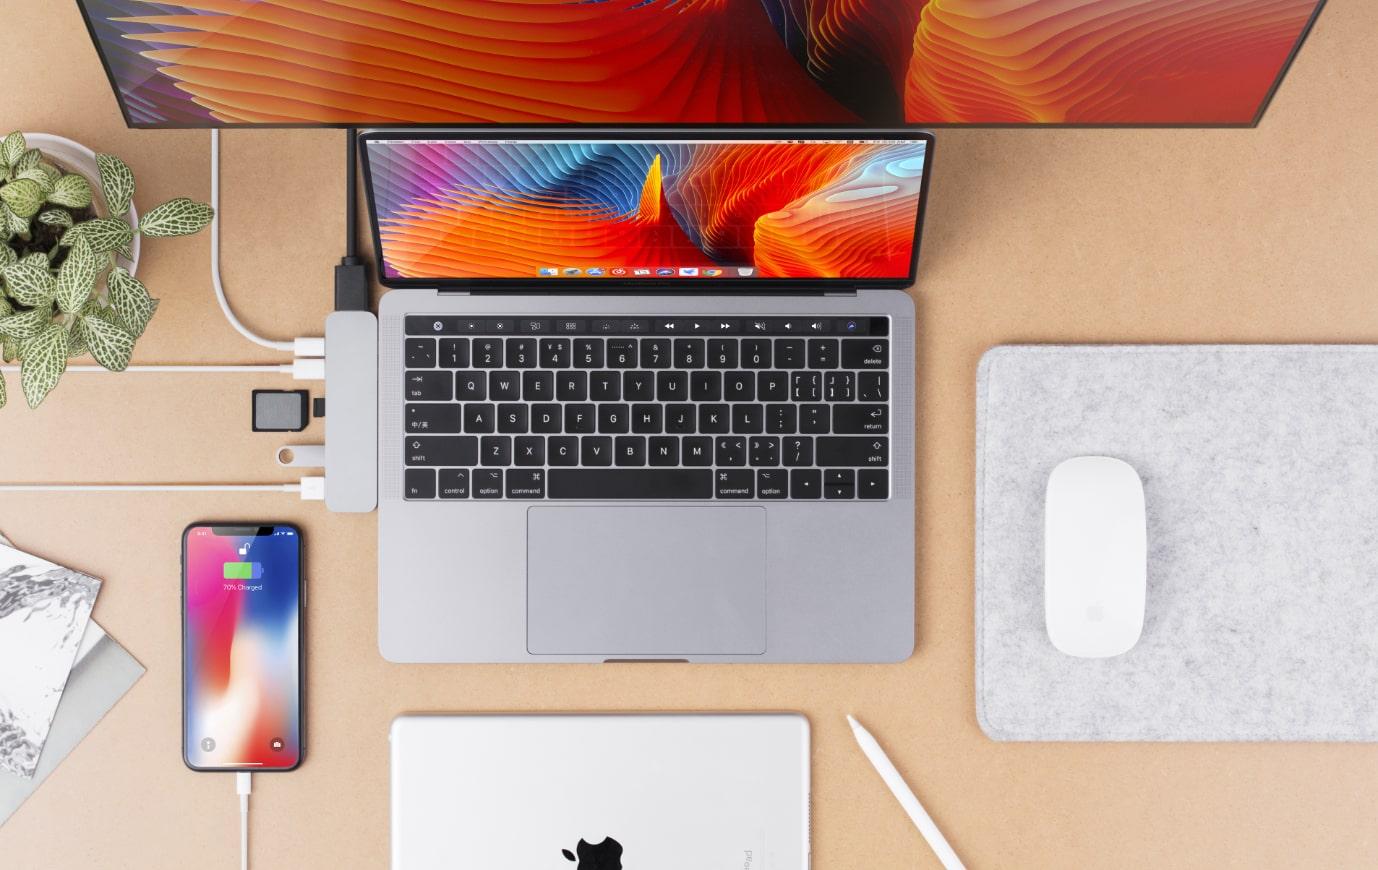 HyperDrive DUO 7 ve 2 USB-C Hub na MacBook Pro / Air